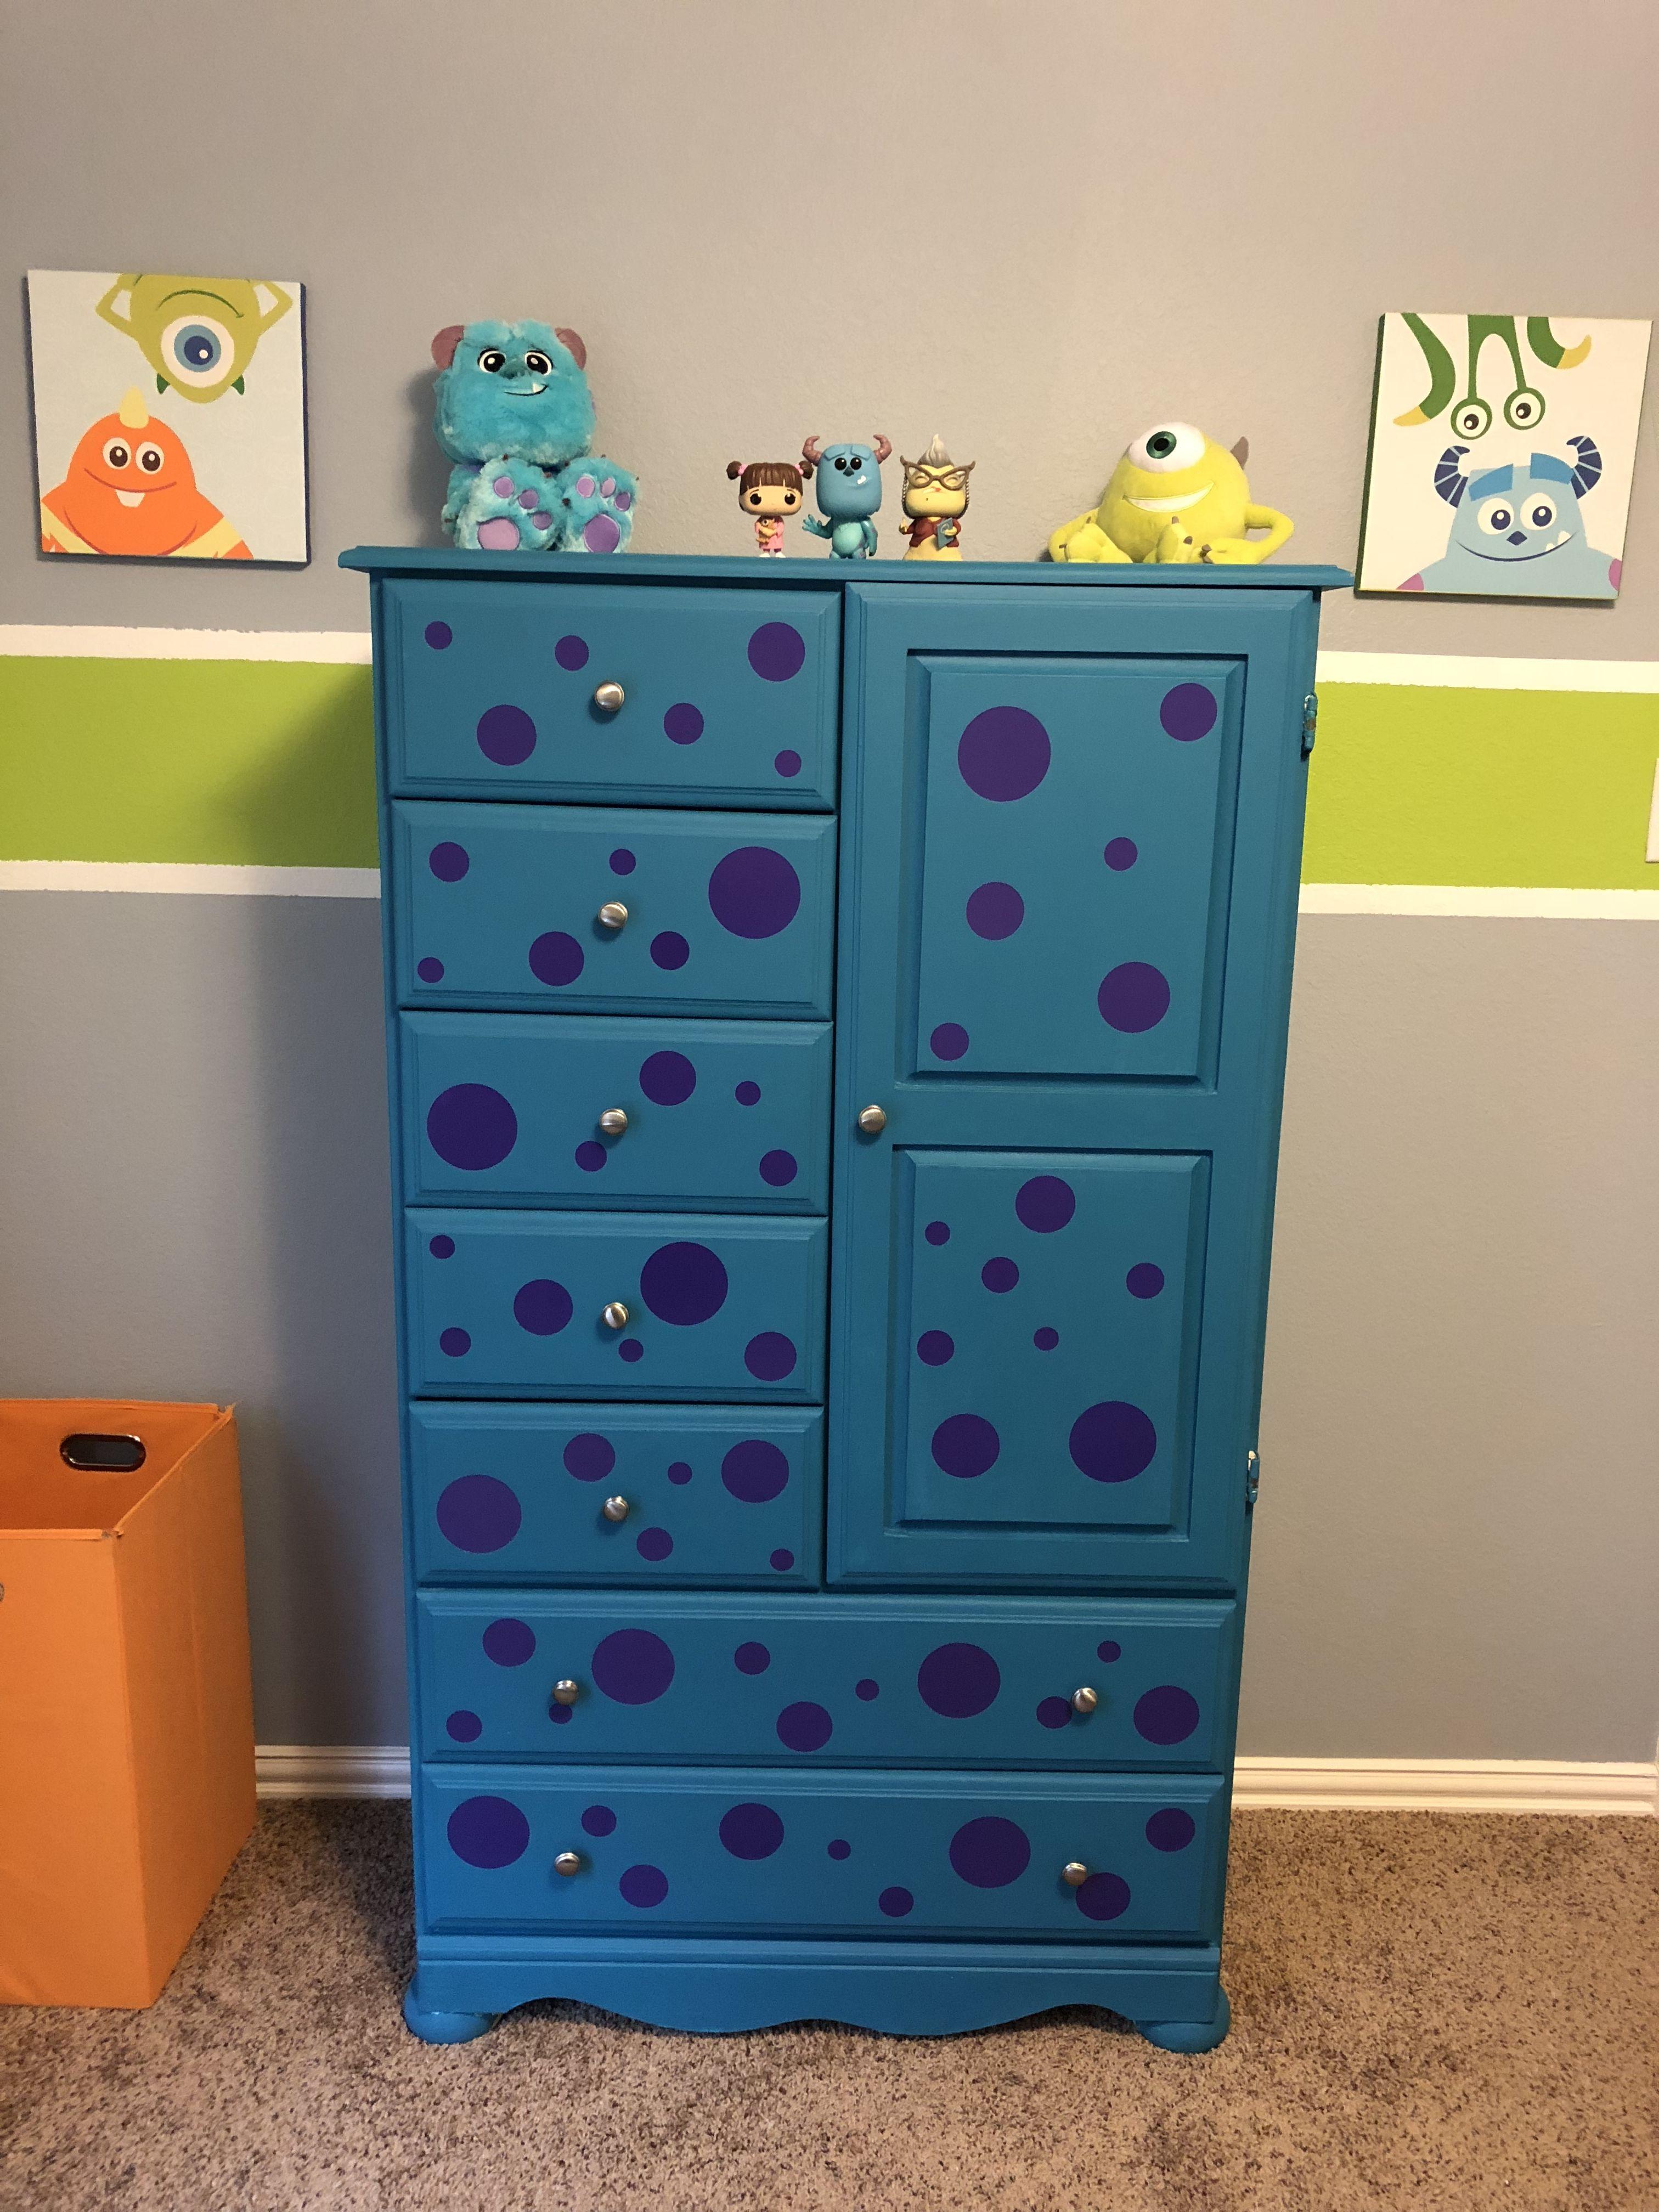 Our Sons Dresser Inspired By Monsters Inc Monstersinc Nursery Disney Baby Boy Room Nursery Disney Baby Rooms Boy Nursery Themes